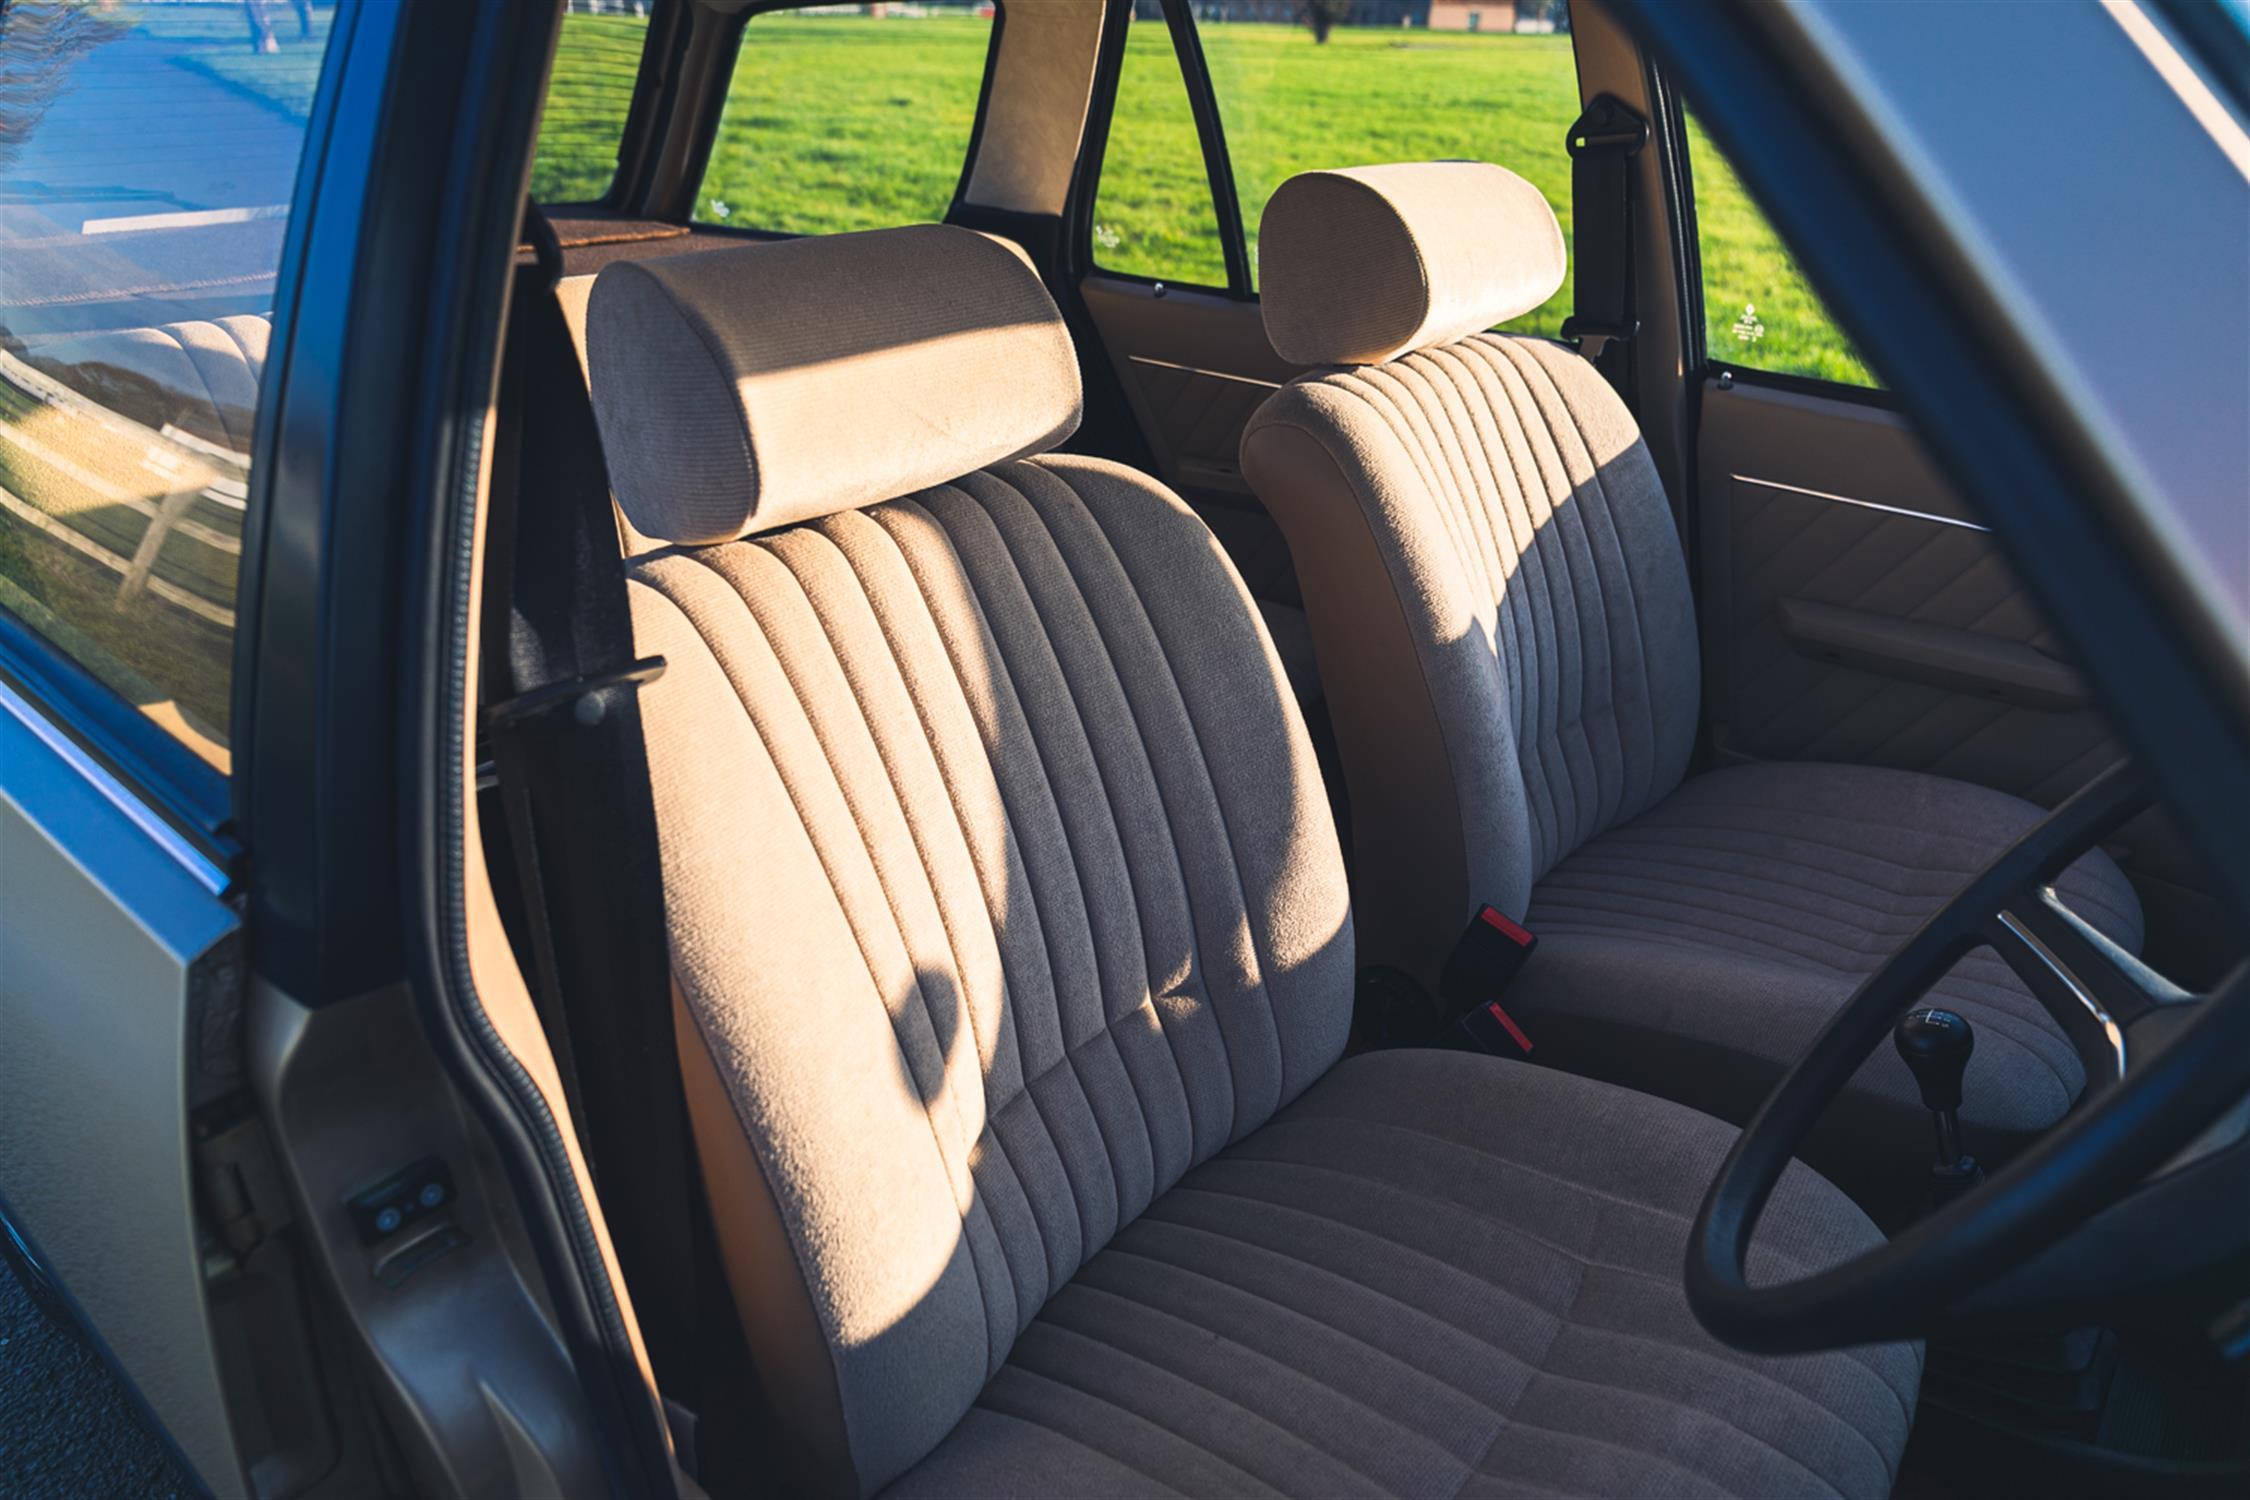 1983 Renault 18 GTL Estate - Image 17 of 32